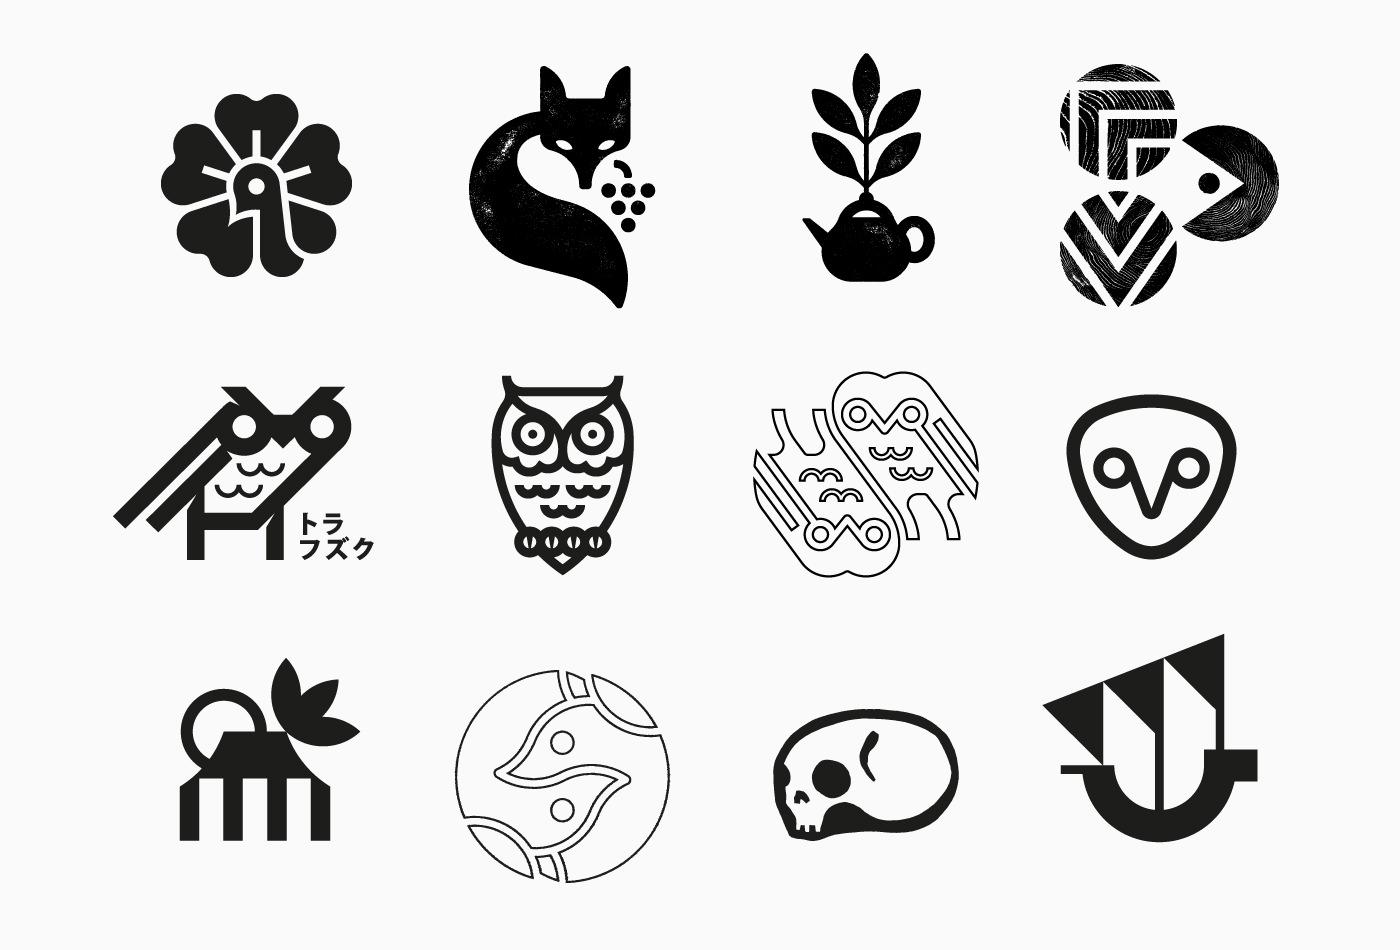 logomark-mark-logo-logos-logotype-brand-branding-pittogramma-vacaliebres-marks-pictograms-signs